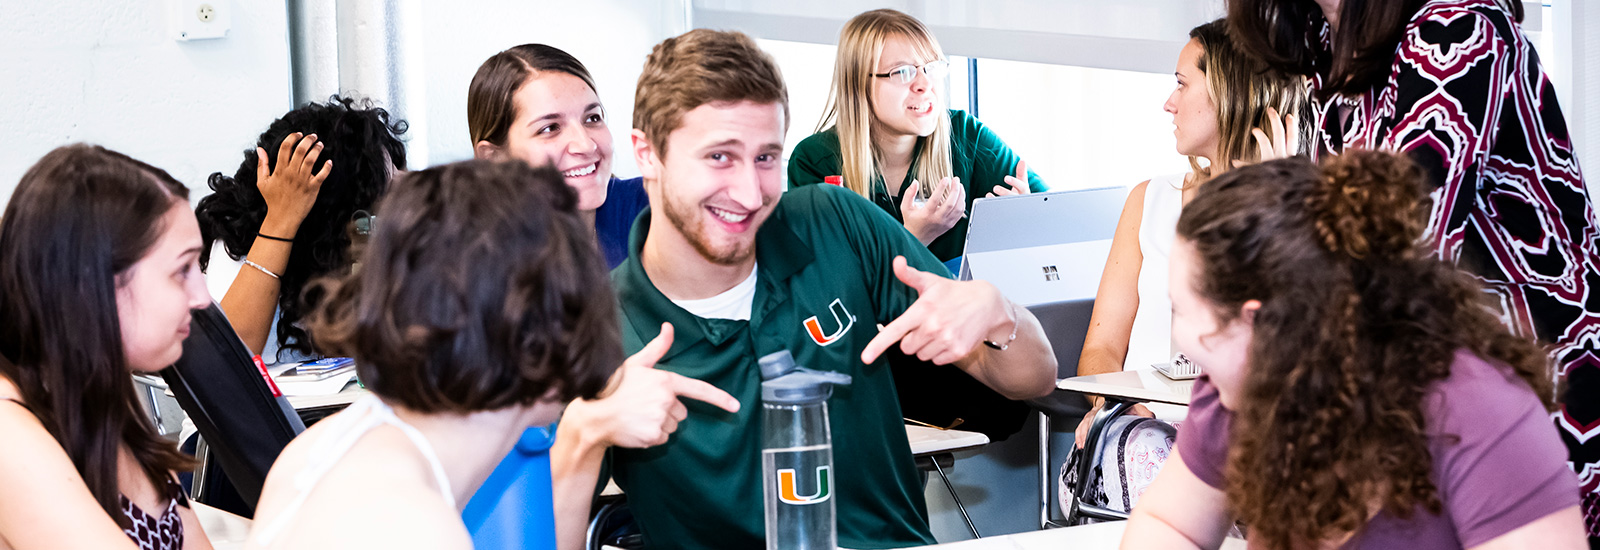 Frost School of Music - University of Miami